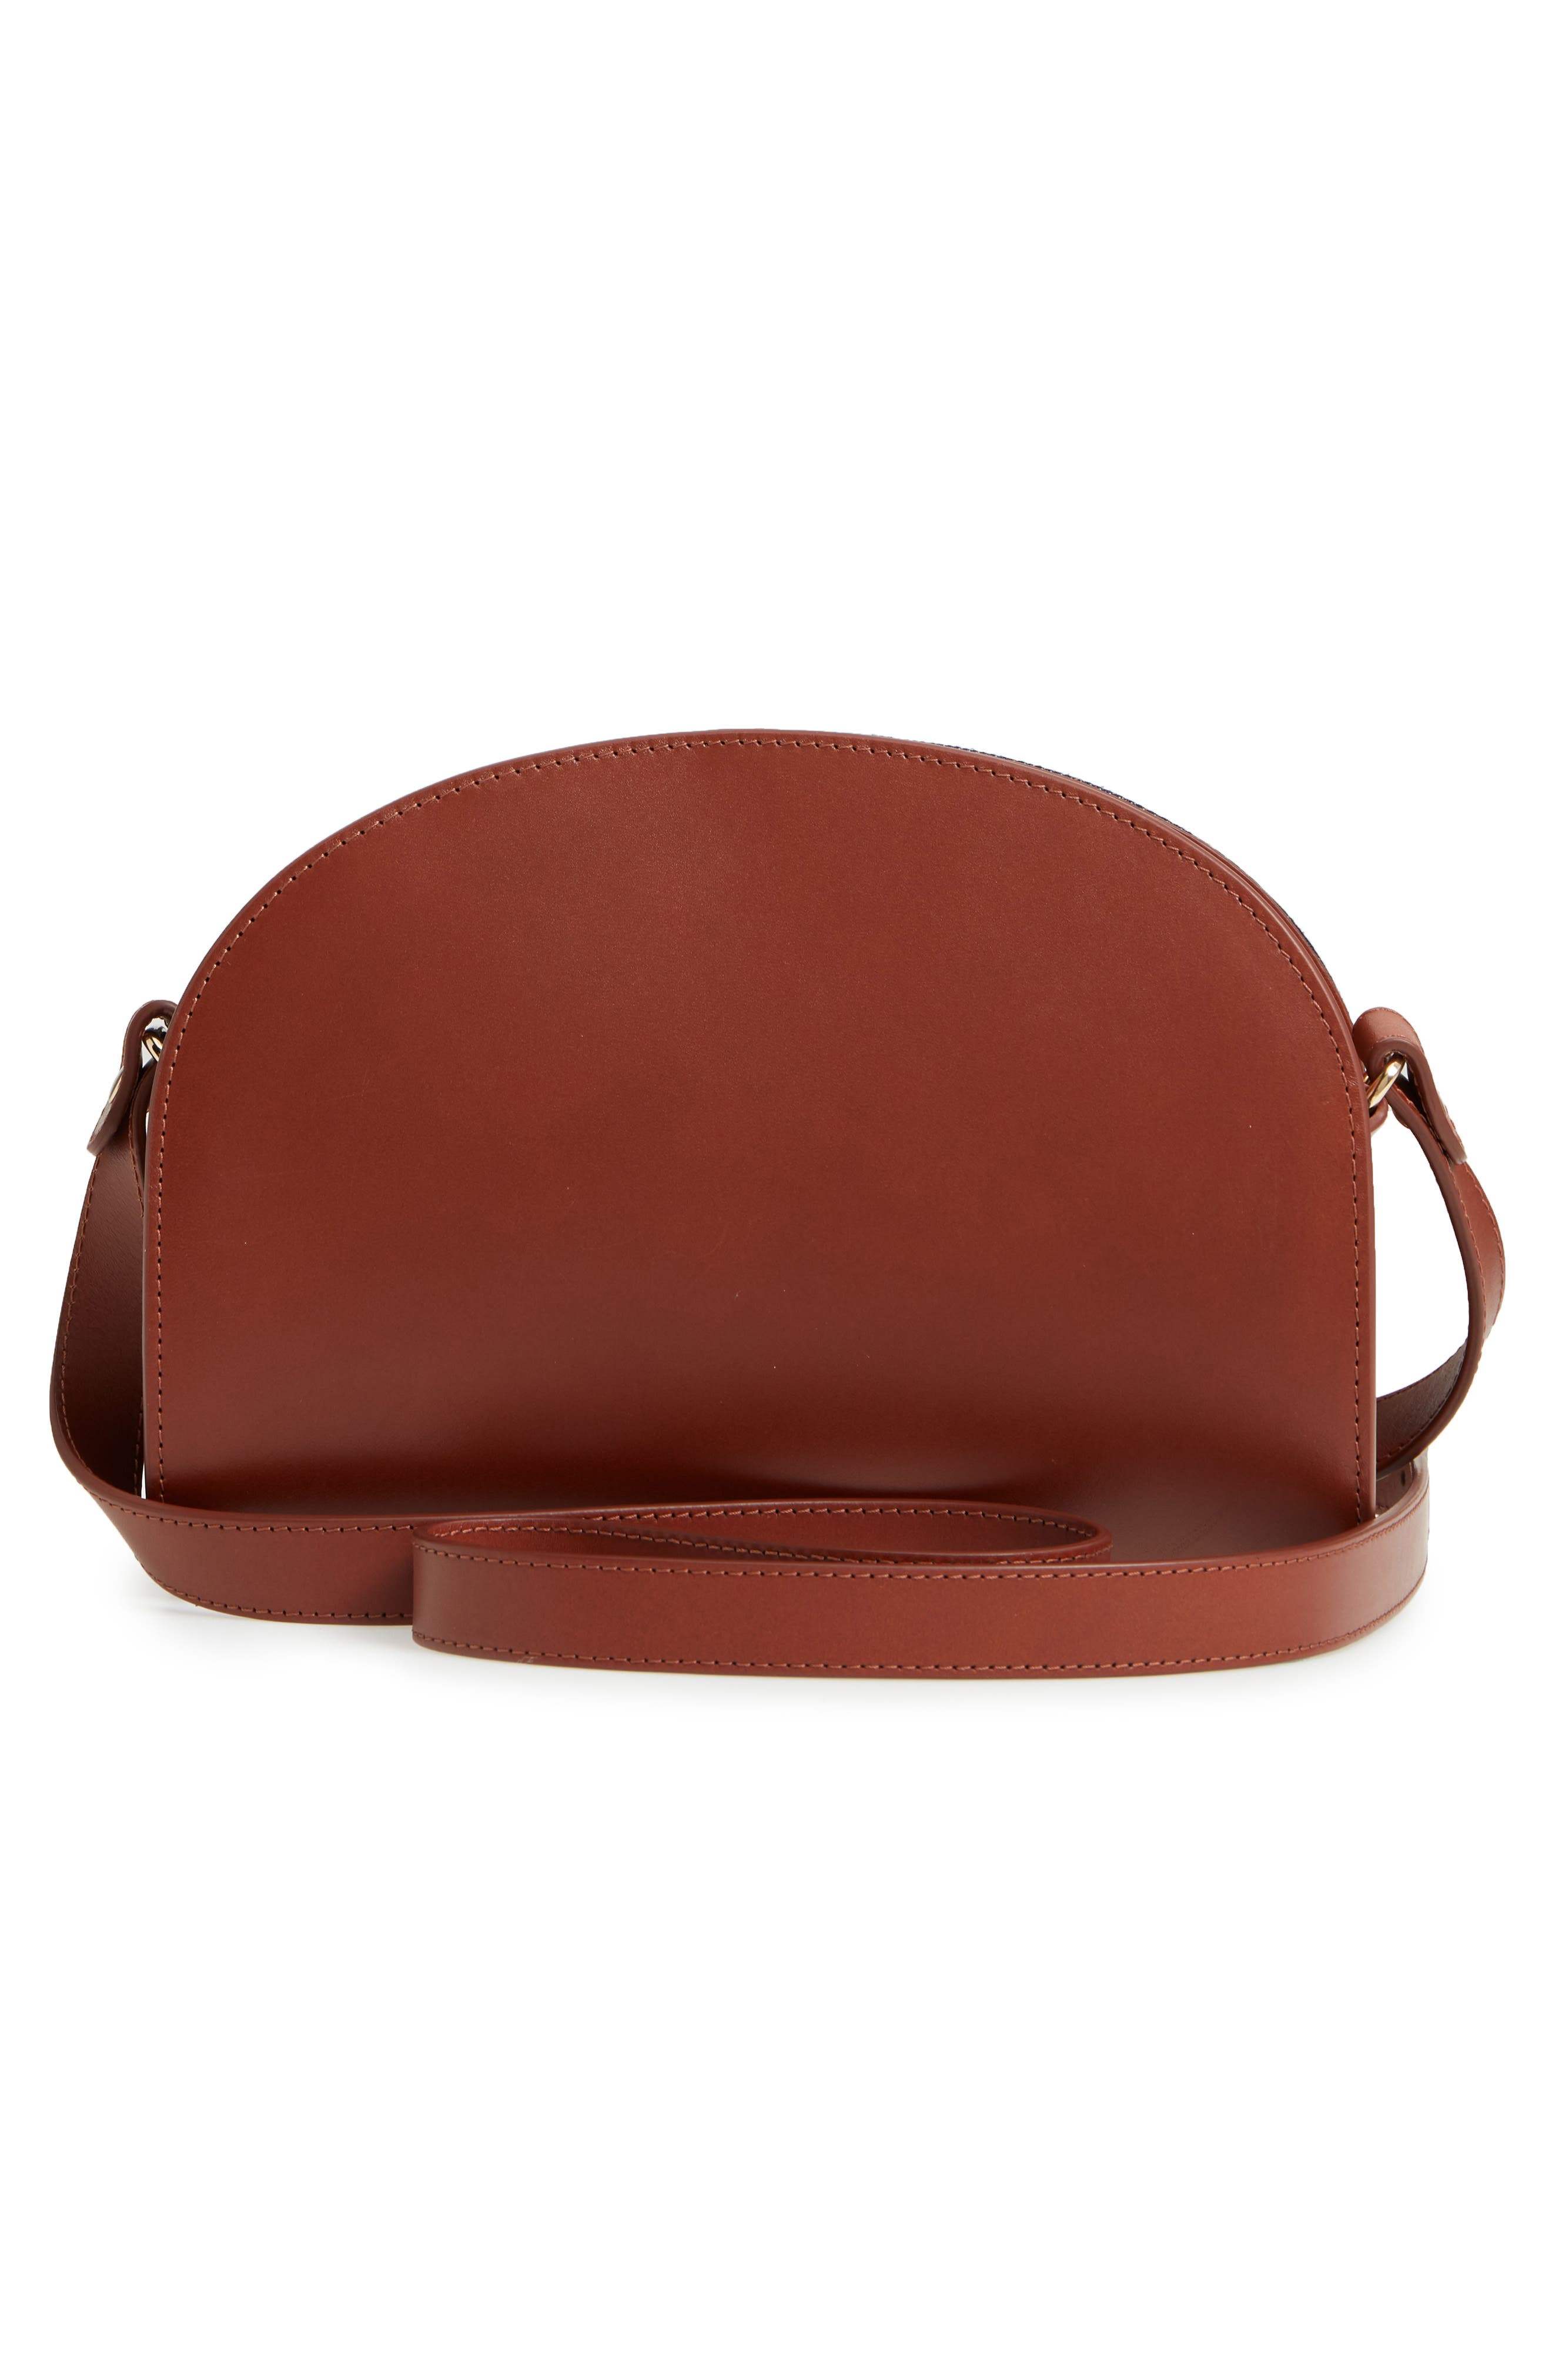 Sac Demilune Leather & Denim Crossbody Bag,                             Alternate thumbnail 3, color,                             NOISETTE CAD